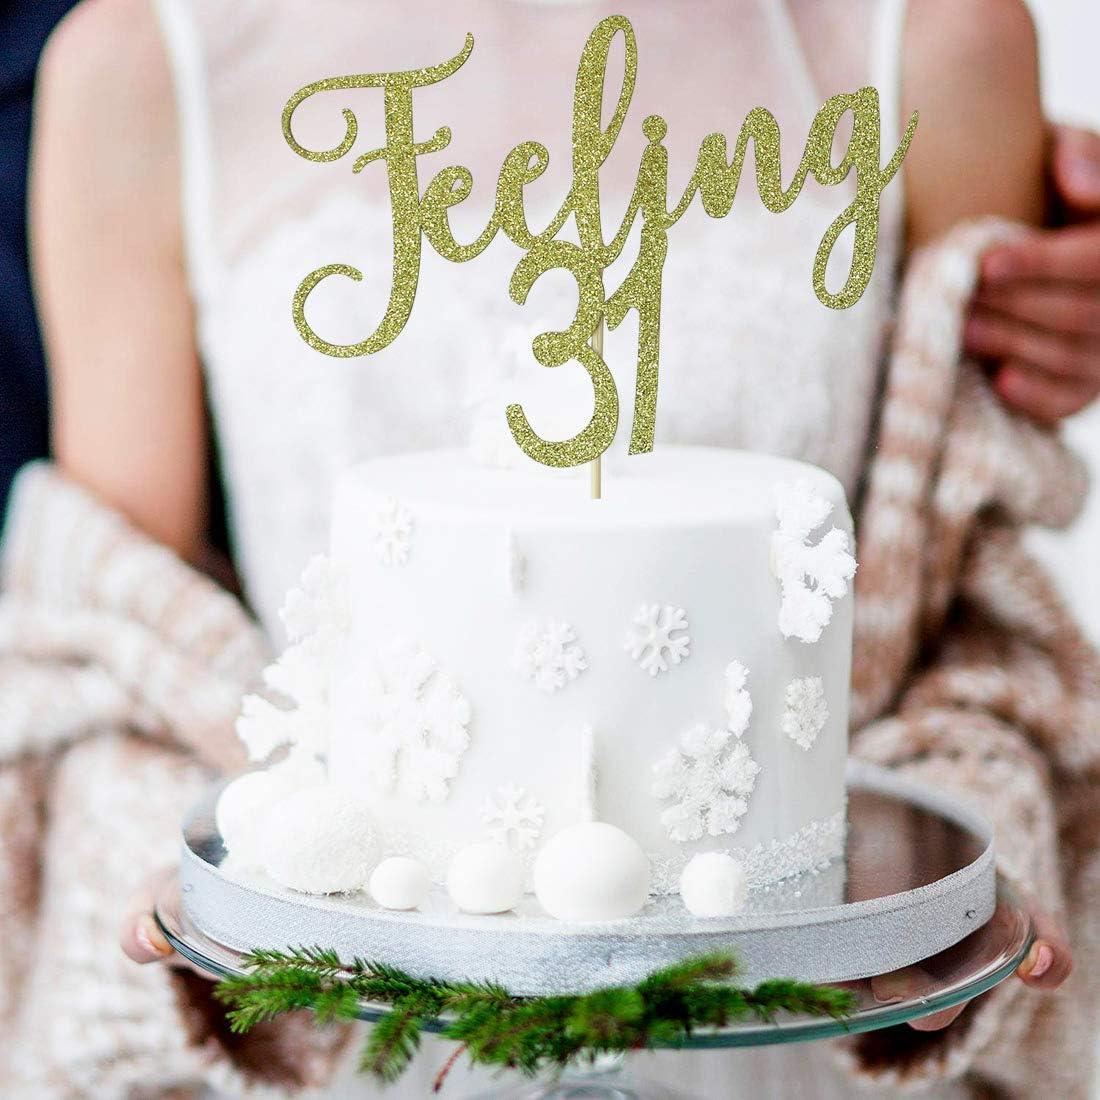 Magnificent Amazon Com Starsgarden Gold Glitter Feeling 31 Cake Topper Funny Birthday Cards Online Barepcheapnameinfo